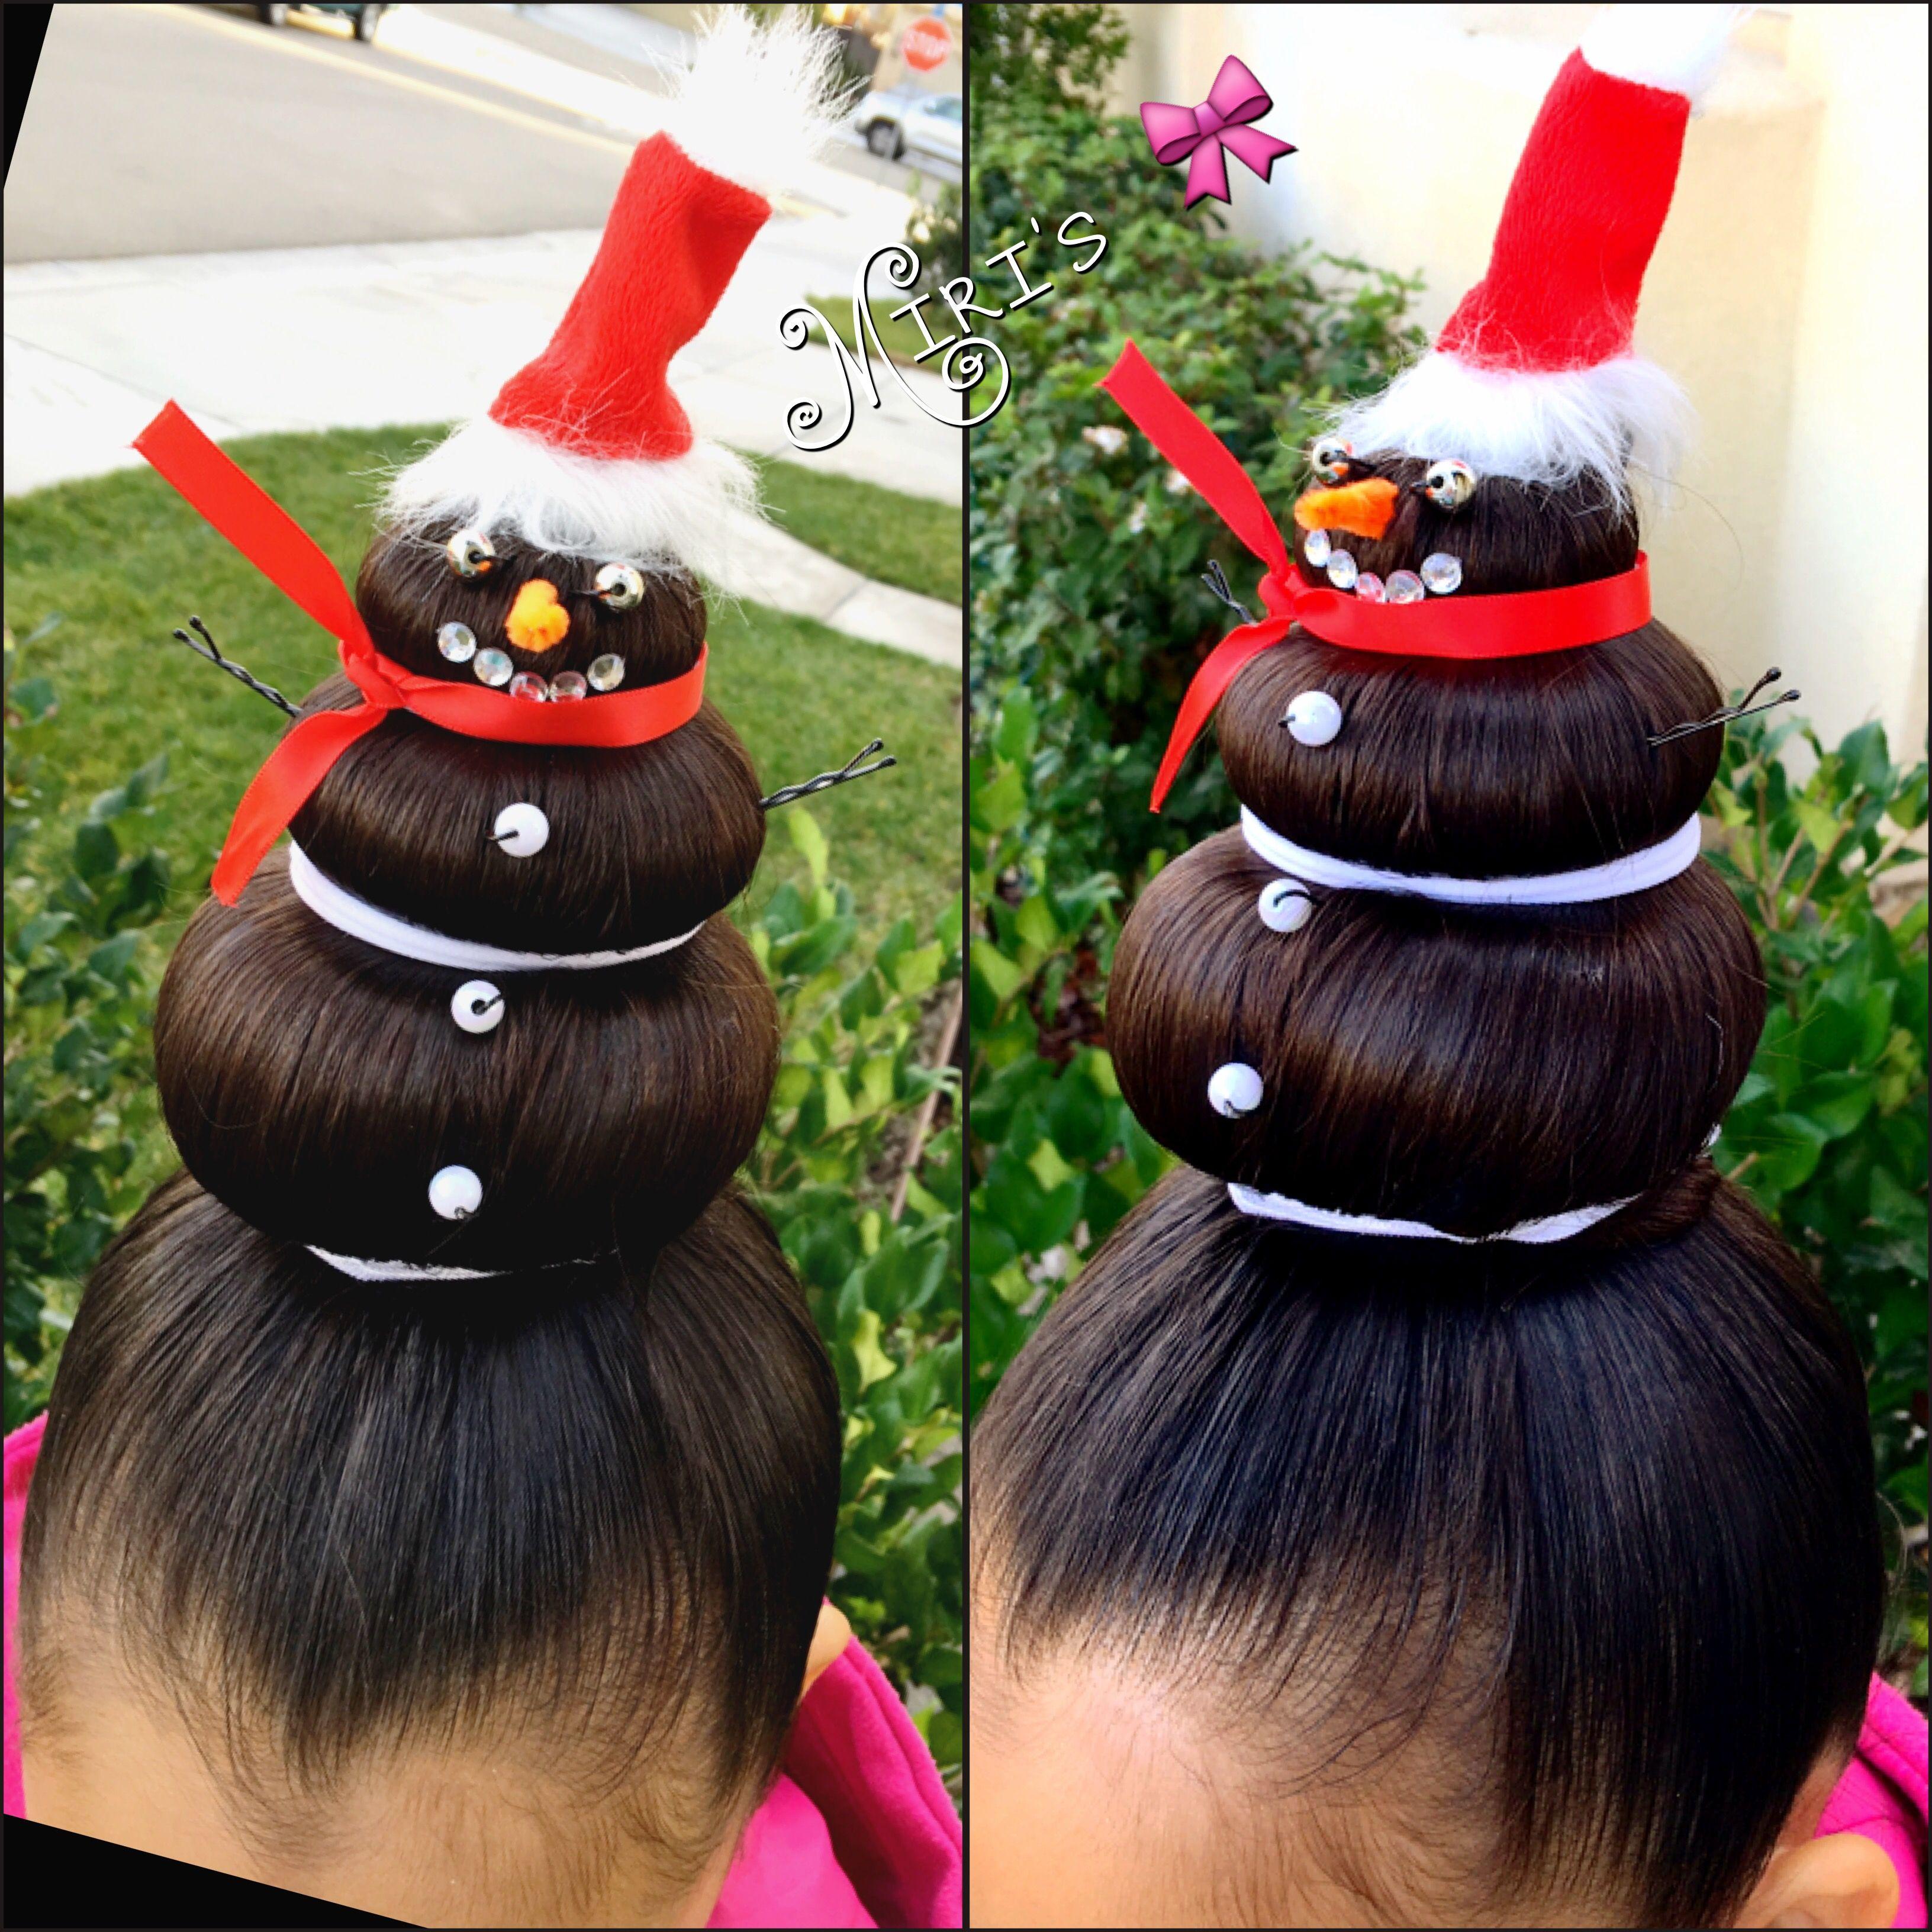 Chirstmas Hair Style For Little Girls Crazy Hair For Kids Artistic Hair Christmas Hair